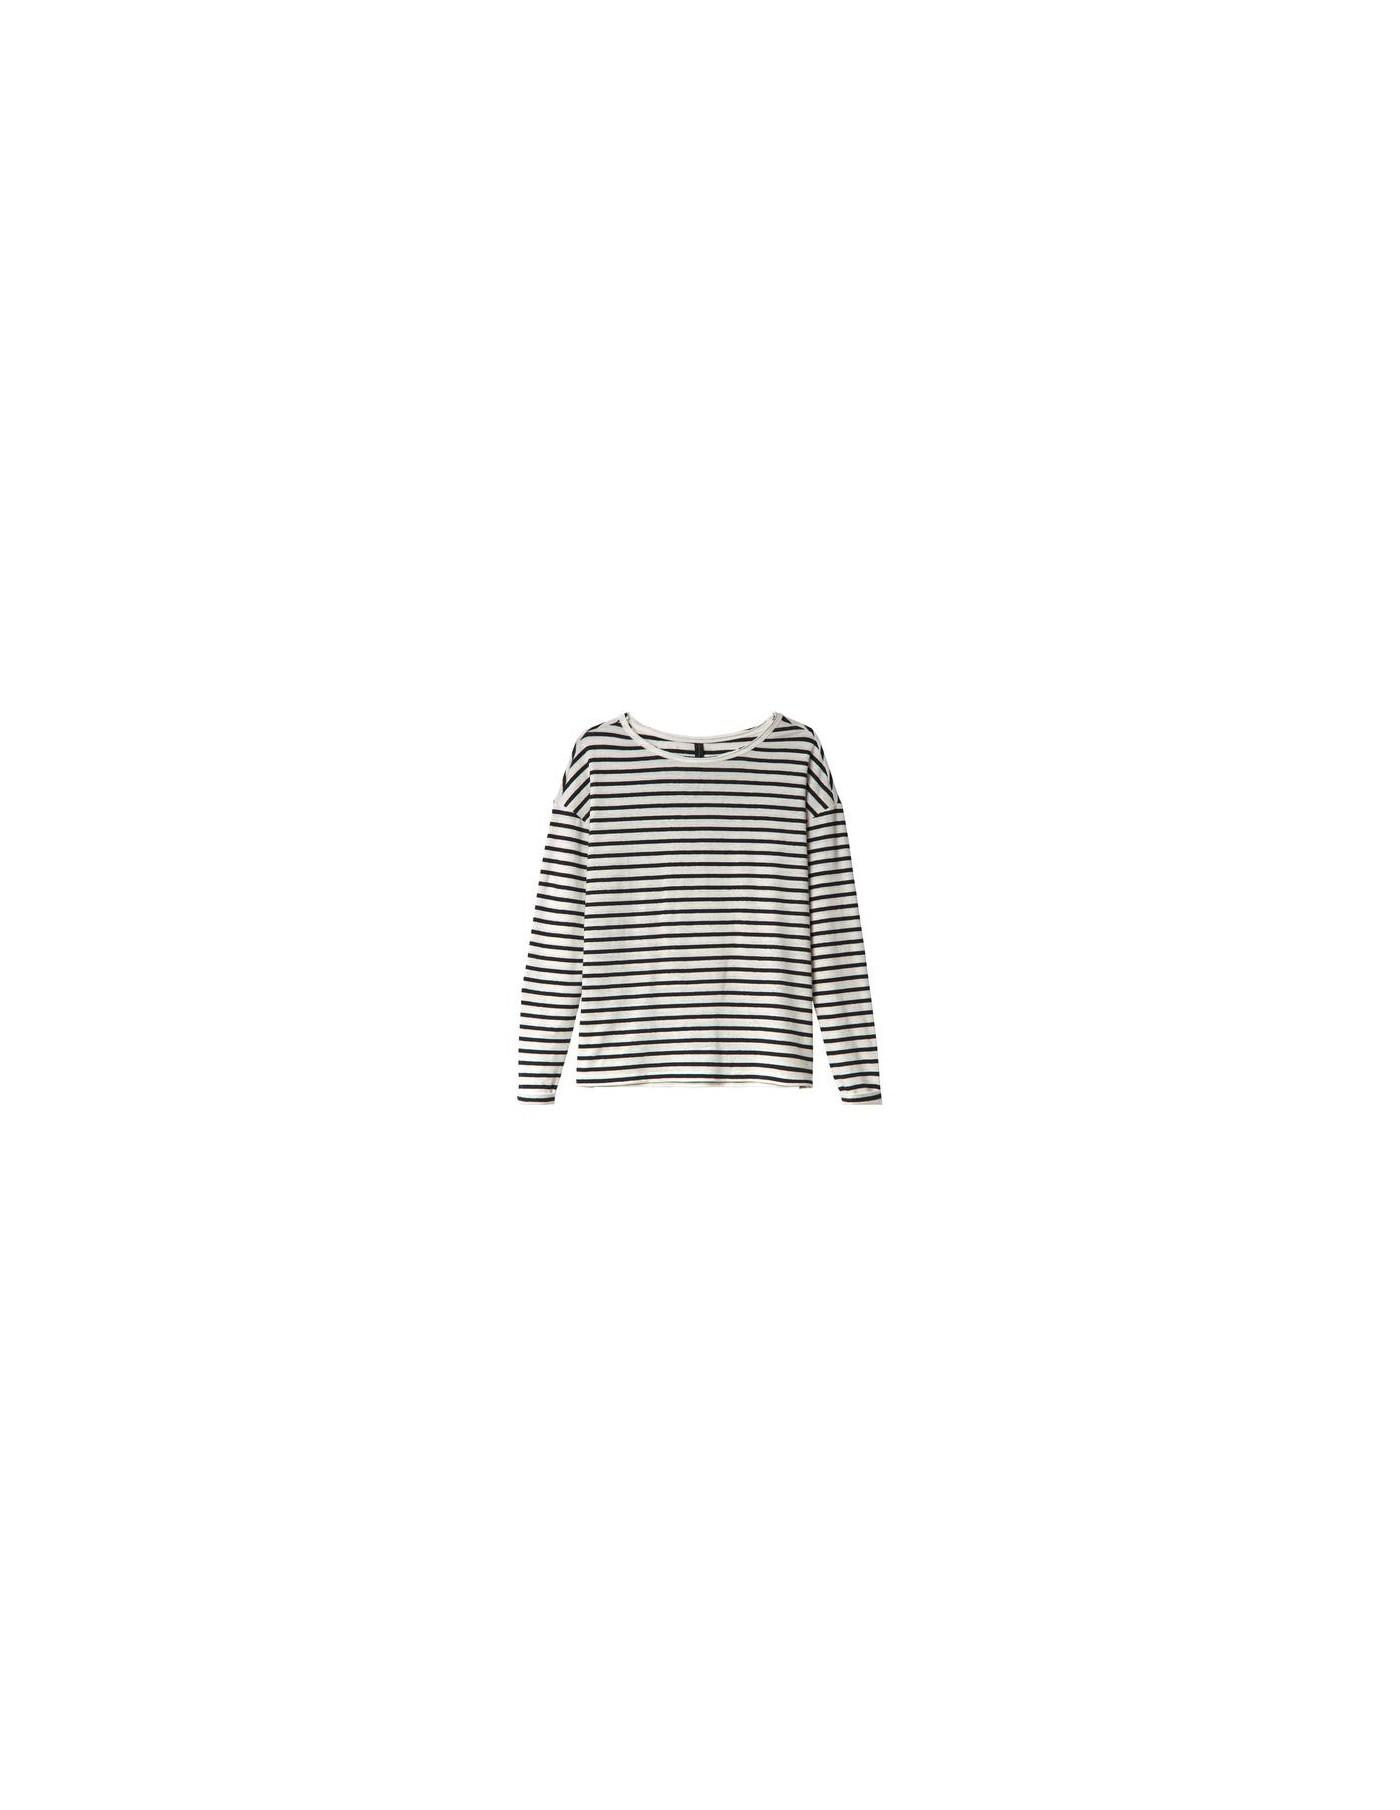 10DAYS Longsleeve Tee Linen Stripes